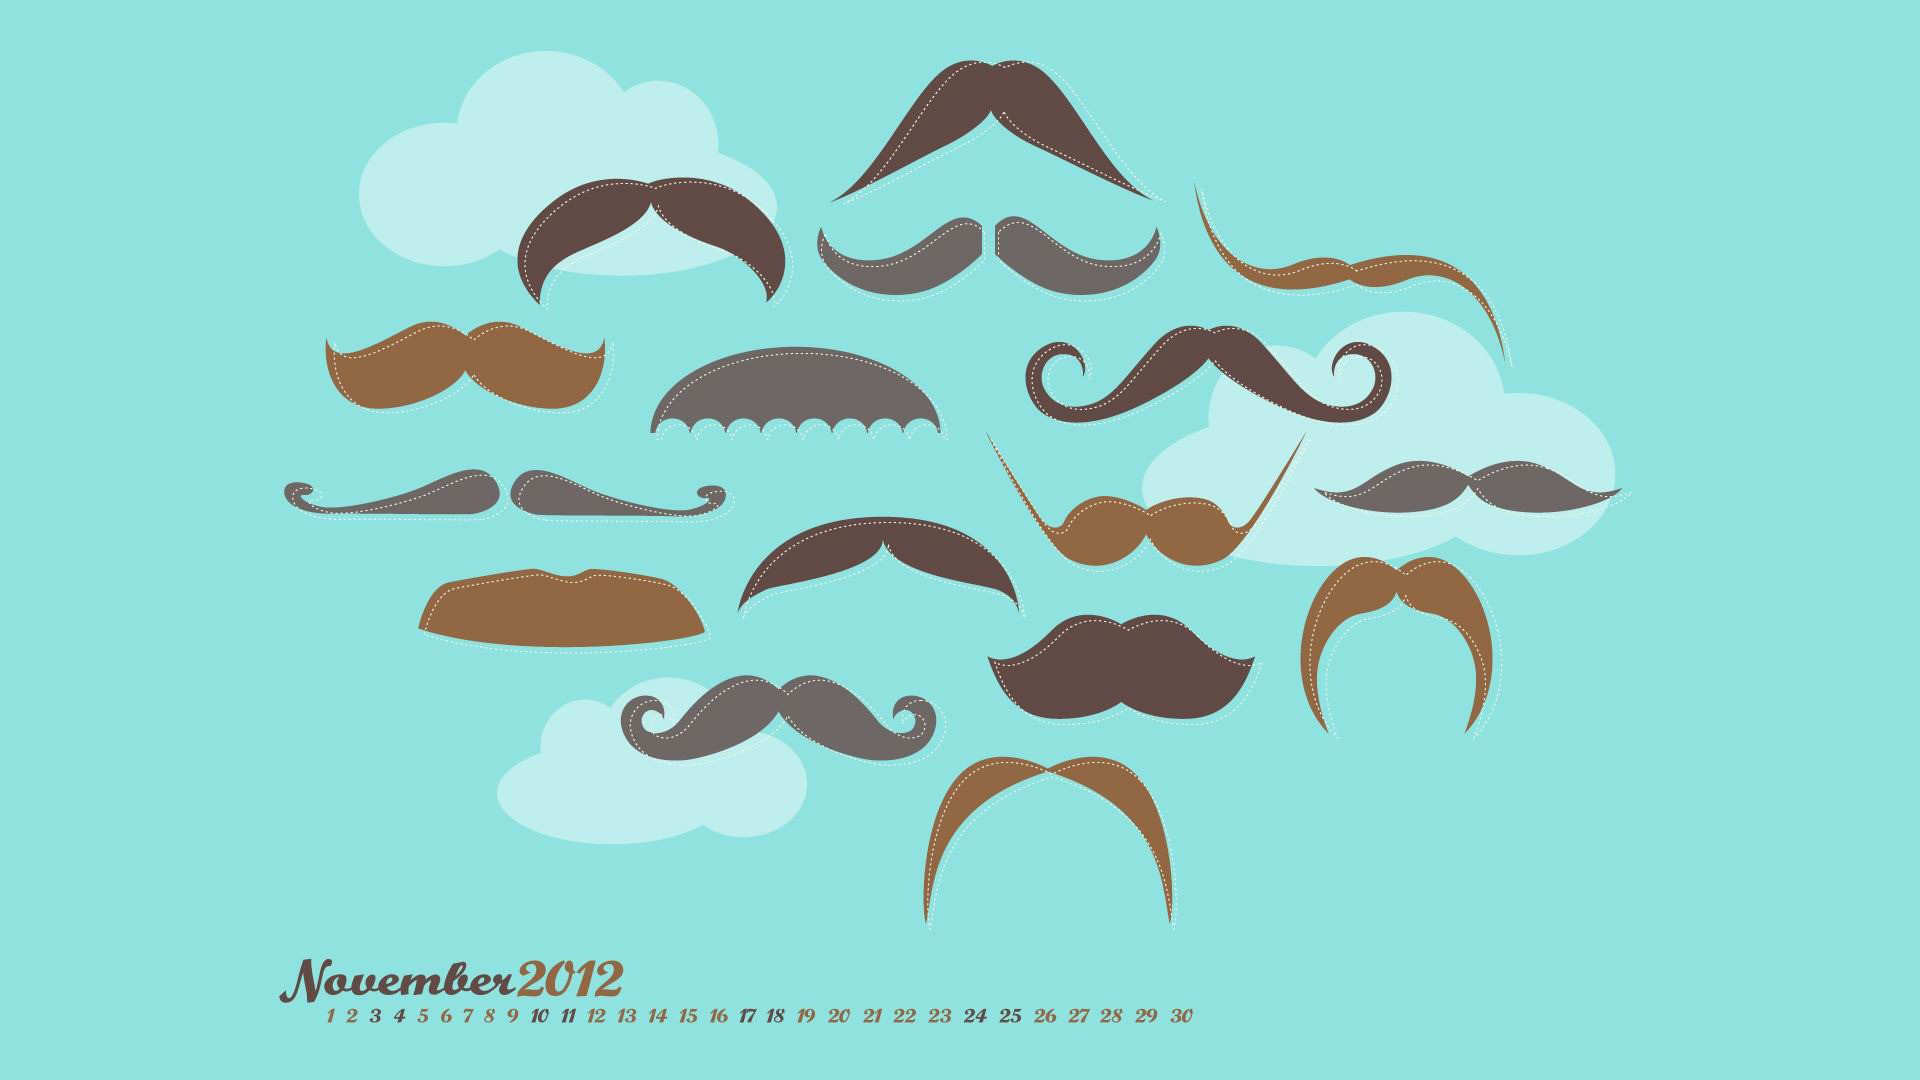 2560x1600 Mrs Moustache Wallpaper By JessyG22 On DeviantArt